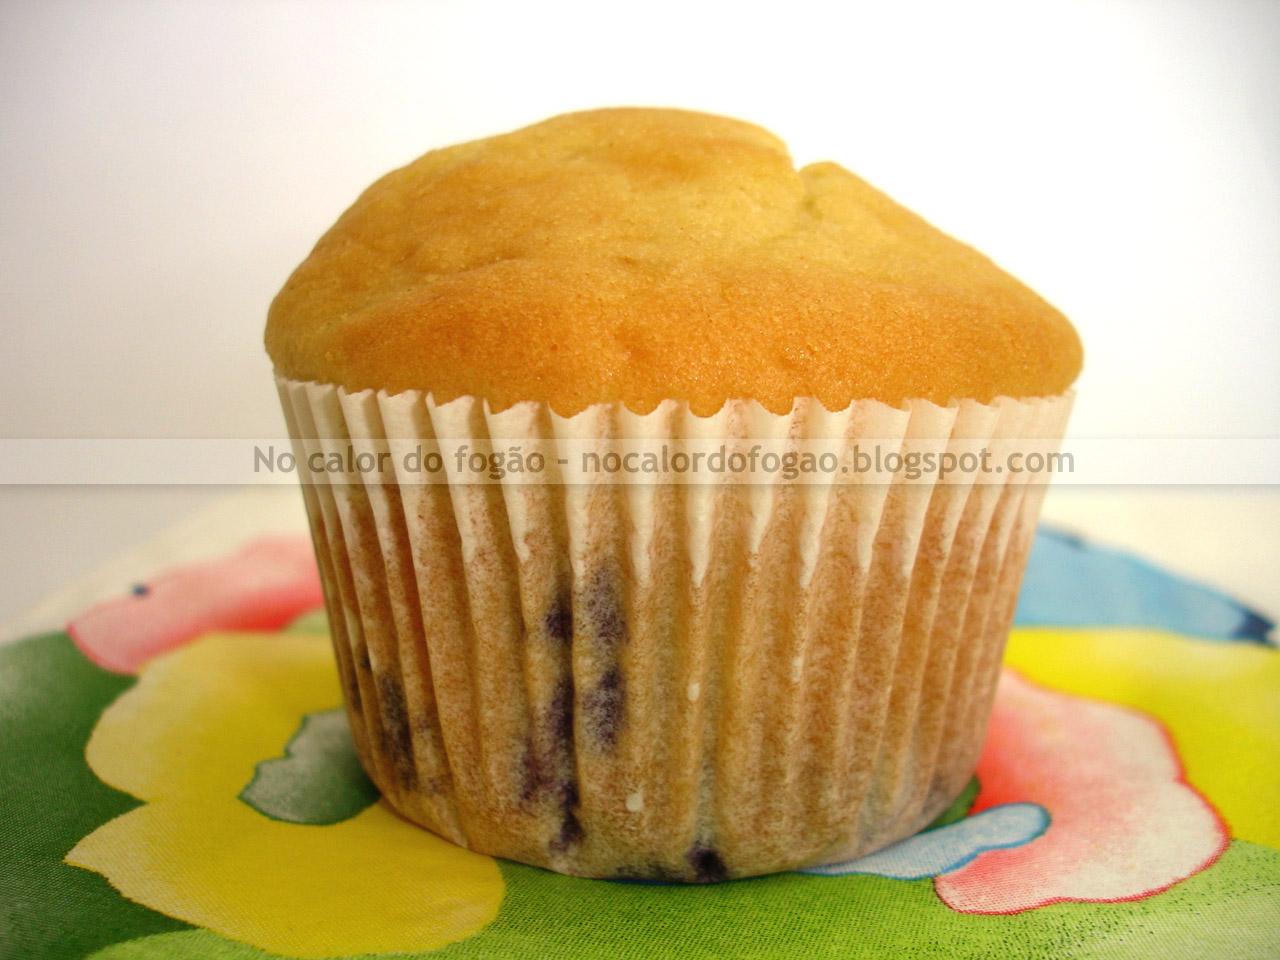 Muffins de morango e mirtilo